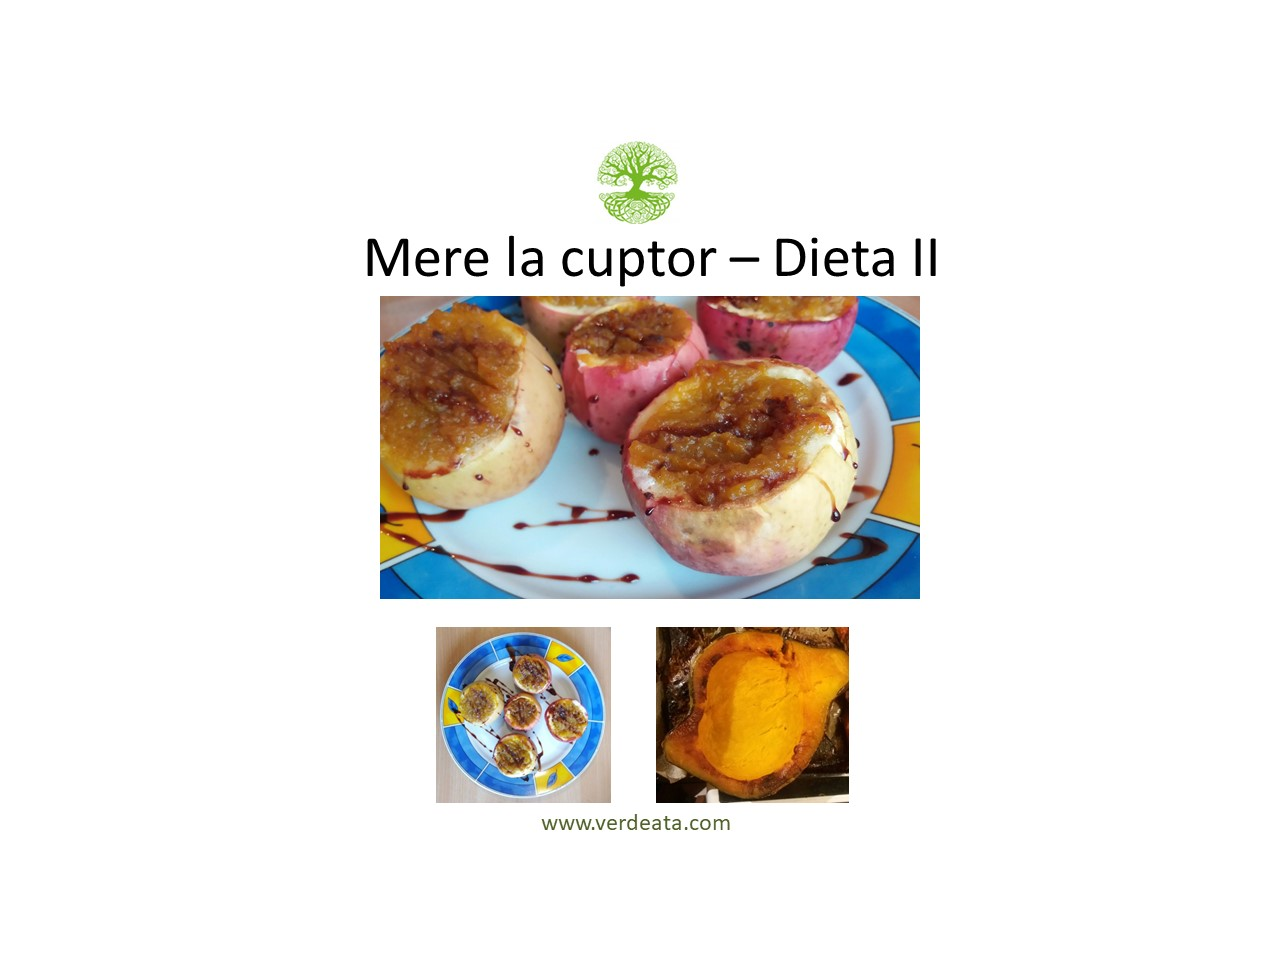 Mere la cuptor - Dieta II